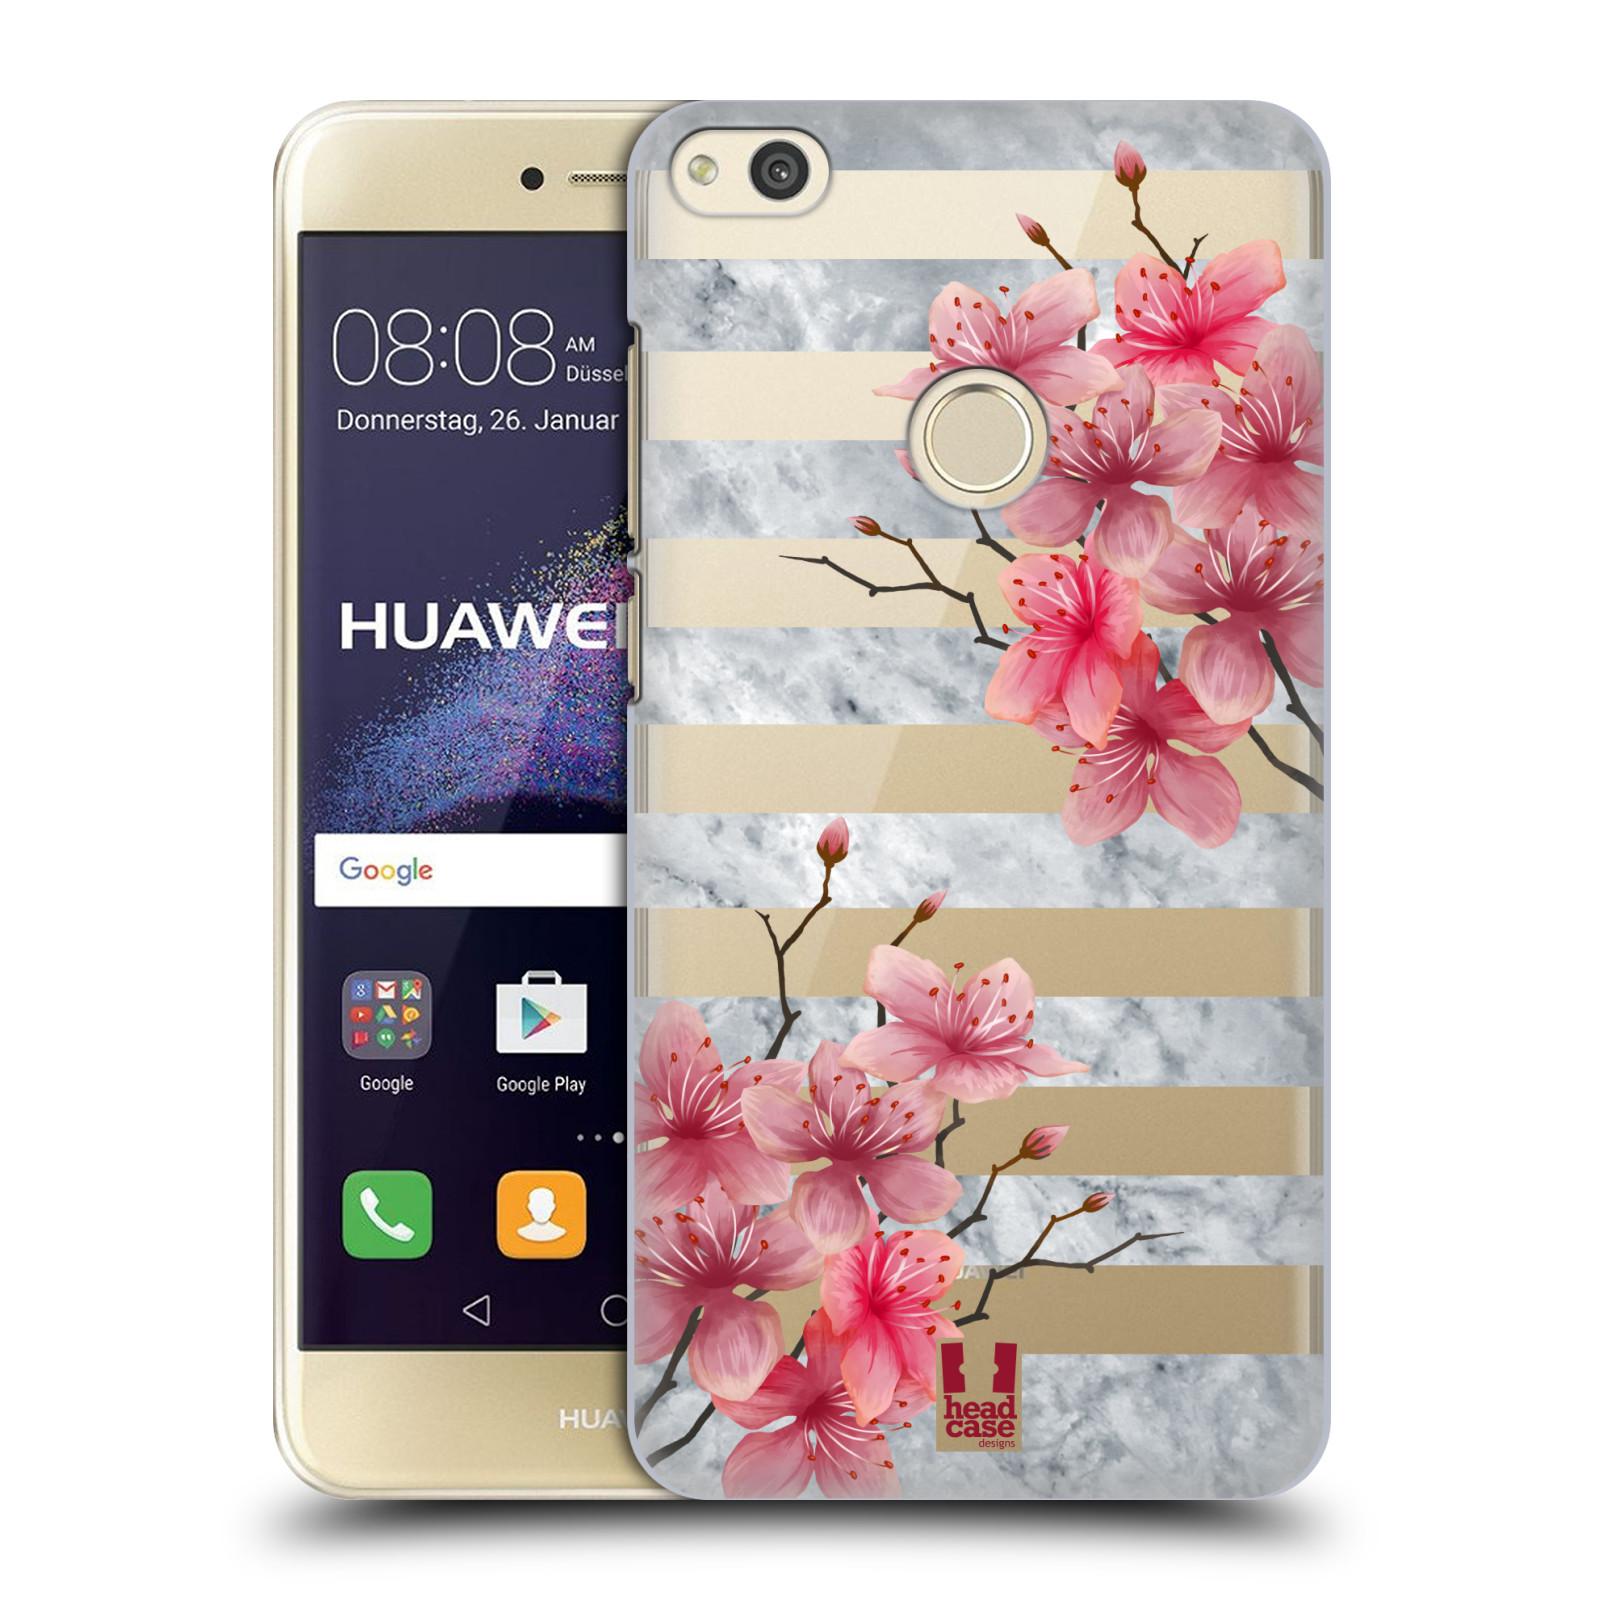 Plastové pouzdro na mobil Huawei P9 Lite (2017) - Head Case - Kvítka a mramor